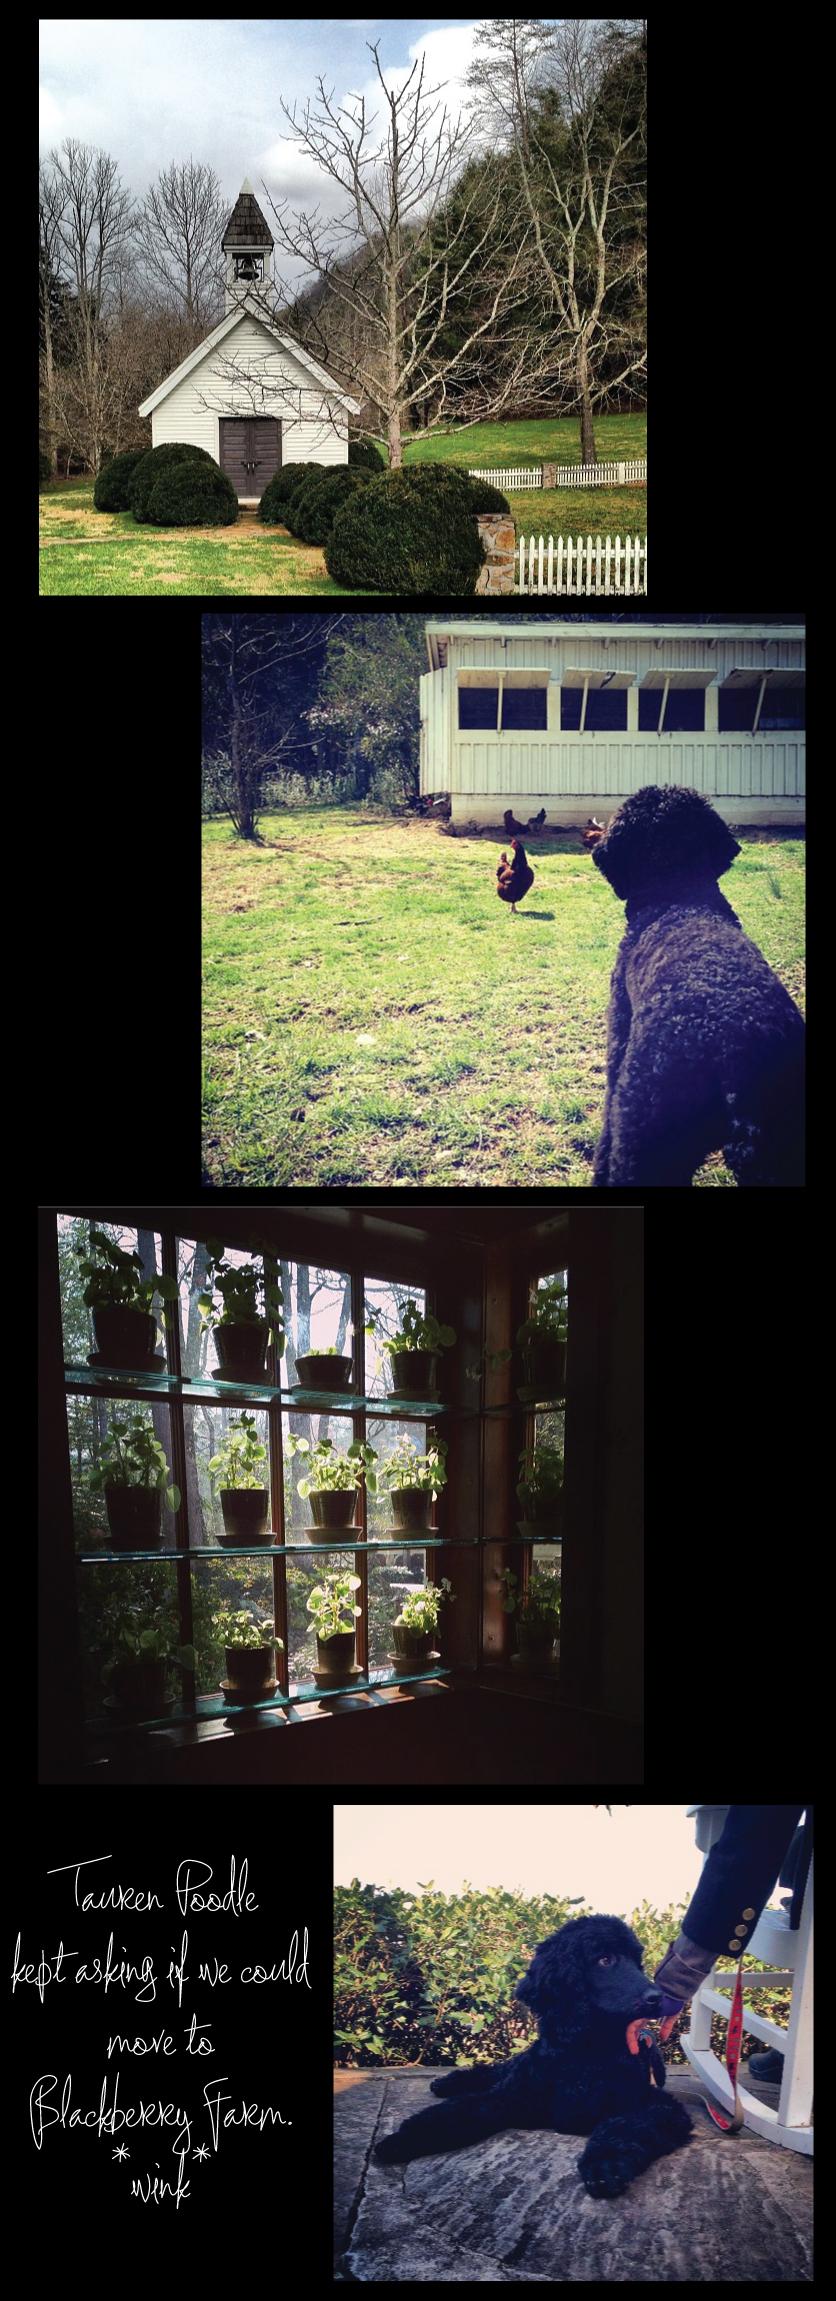 Blackberry-Farm-Chapel-Chicken-Coop-Veranda